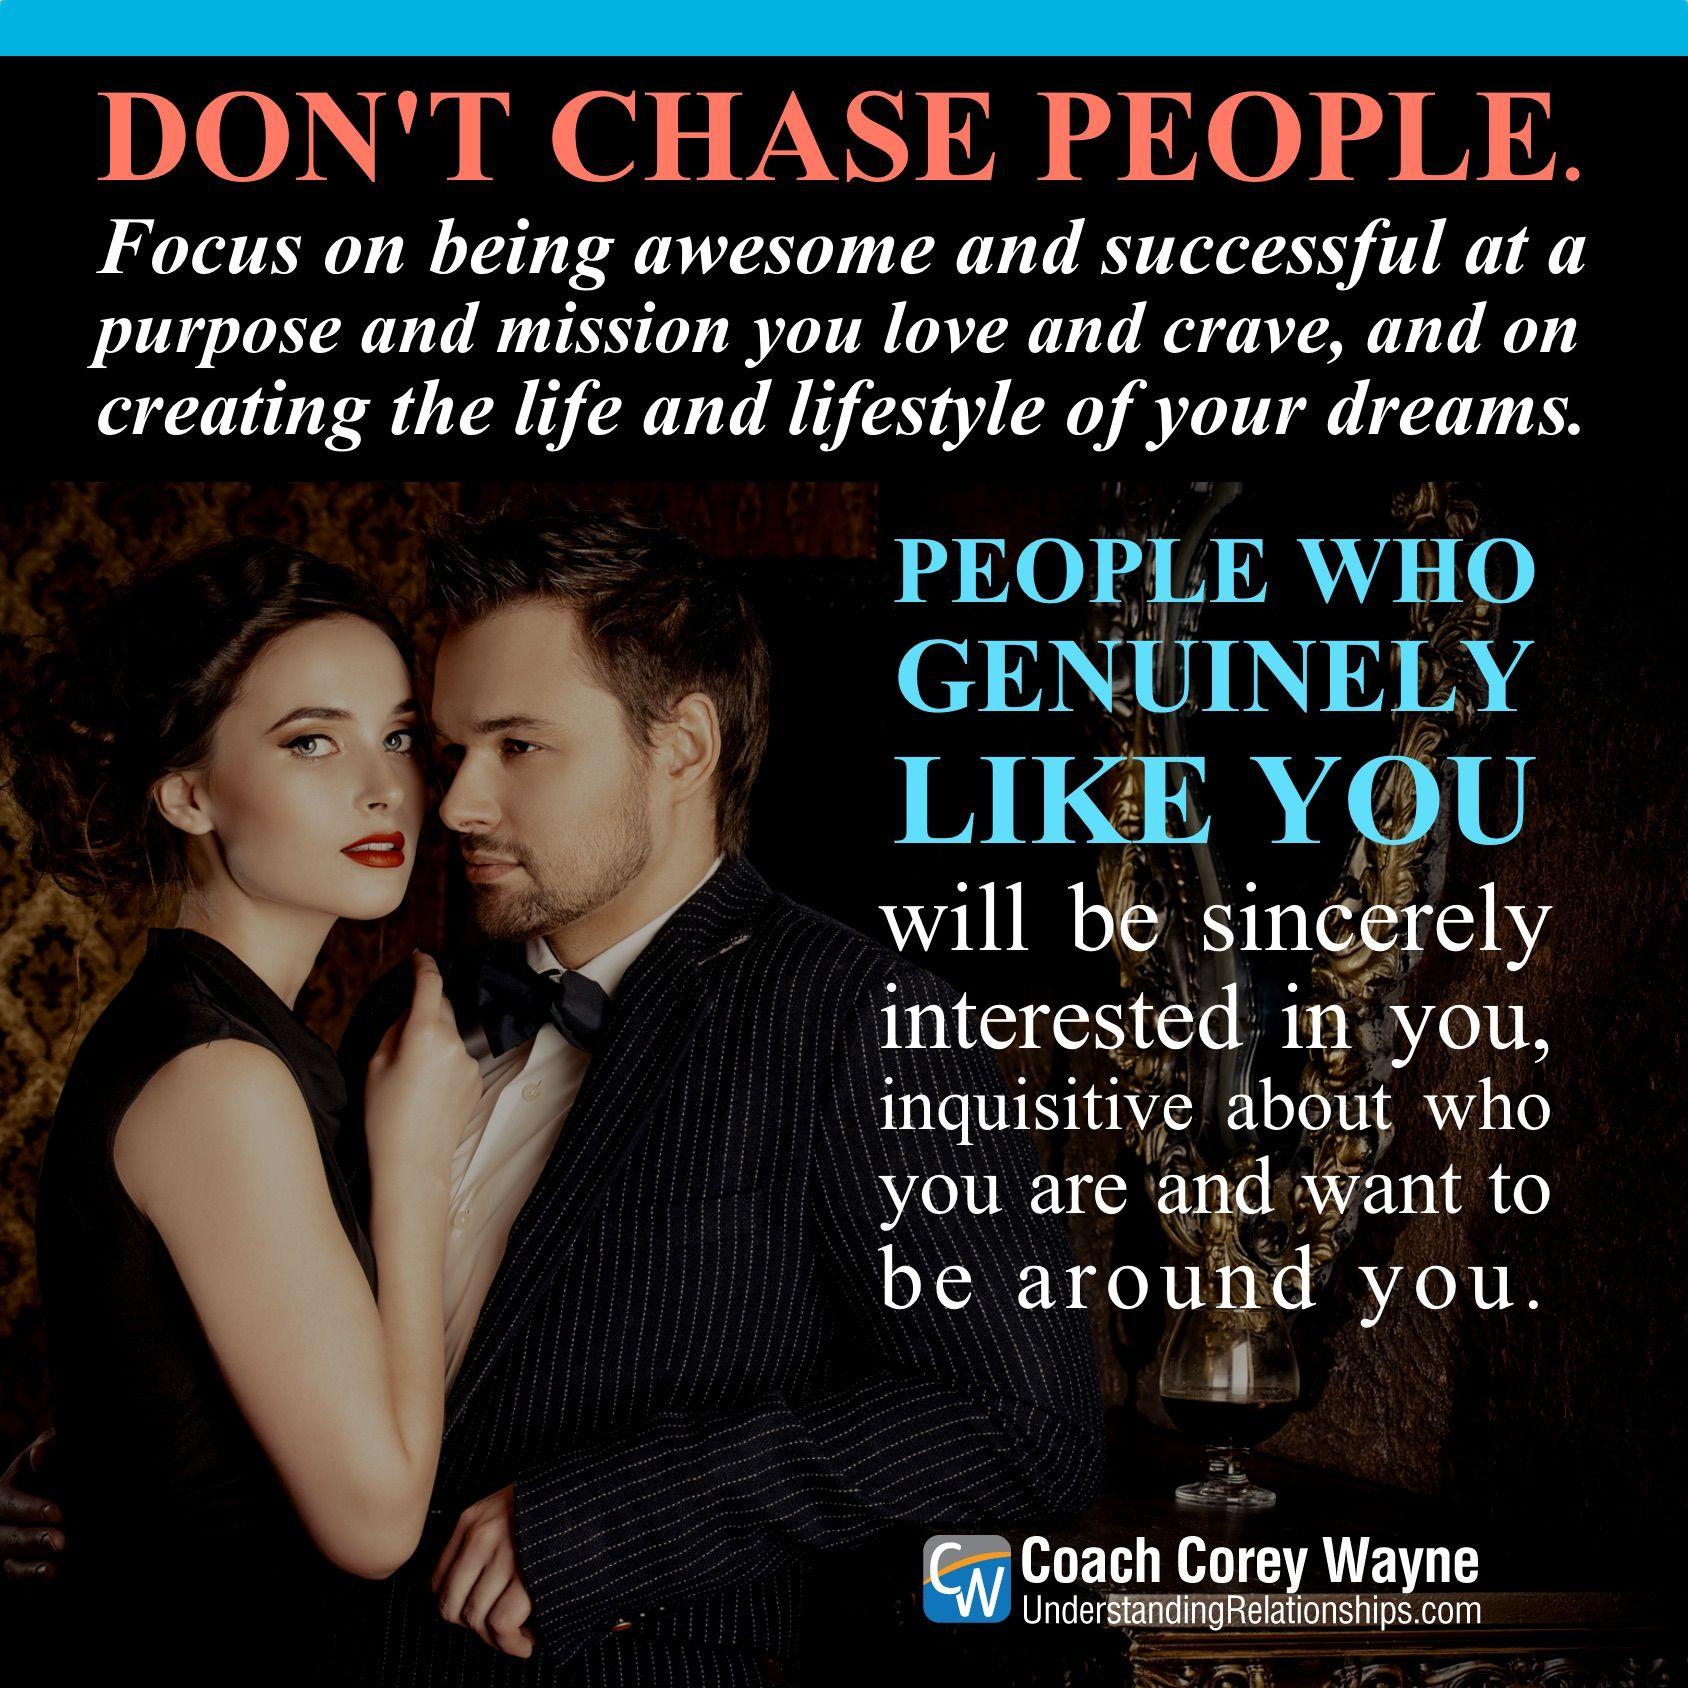 #success #coaching #coachcoreywayne #confidence #quote #motivationalquote  #relationships #women #sex #dating #attraction #love #seduction  #communication ...